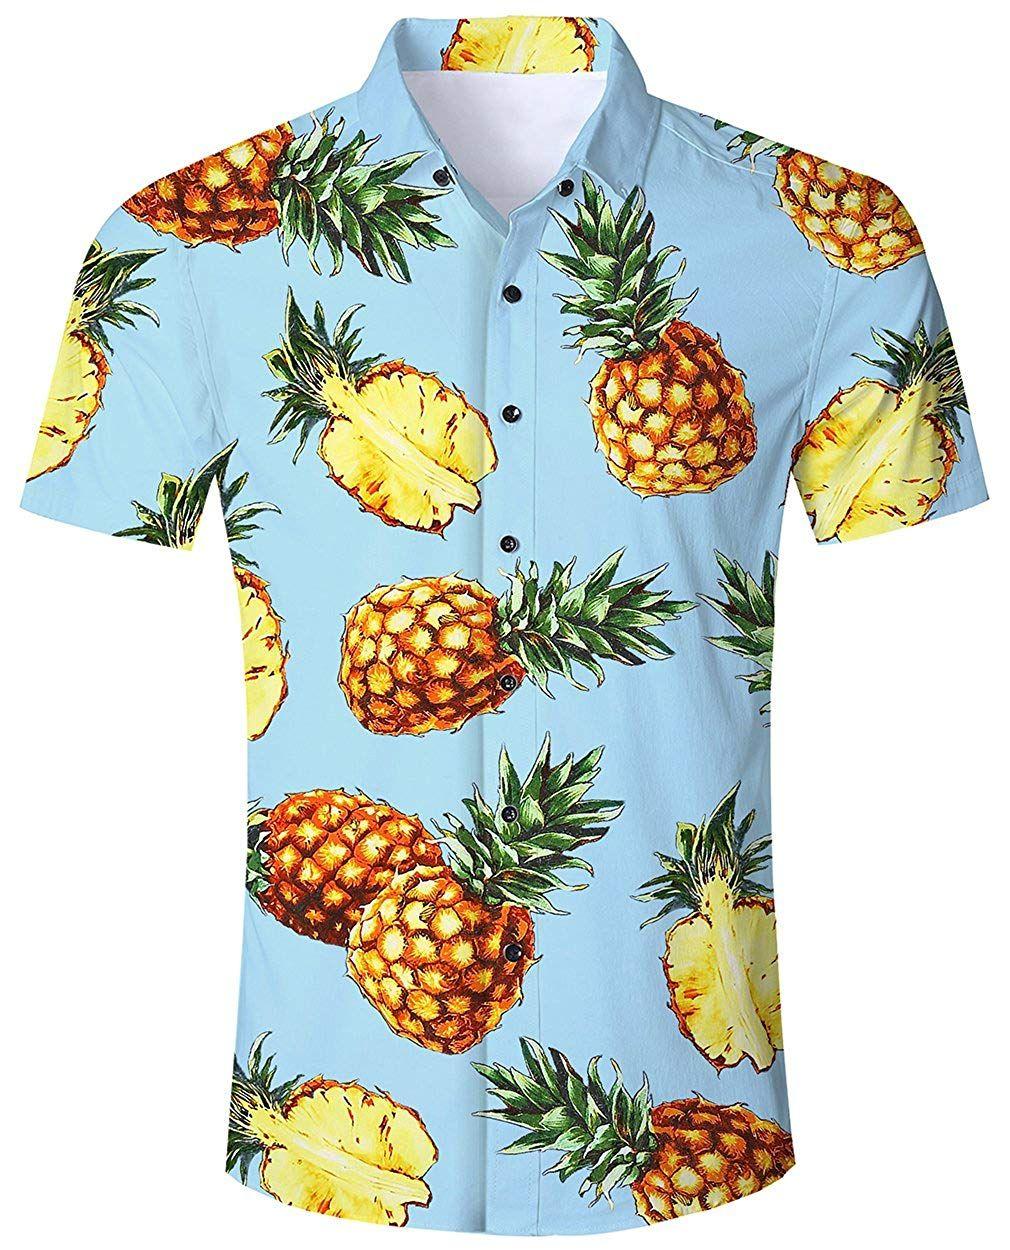 Camisa Hawaiana Para Hombre Mujer Casual Manga Corta Camisas Playa Verano Unisex 3d Estam Camisa Hawaiana Ropa Informal Masculina Camisas Casuales Para Hombres